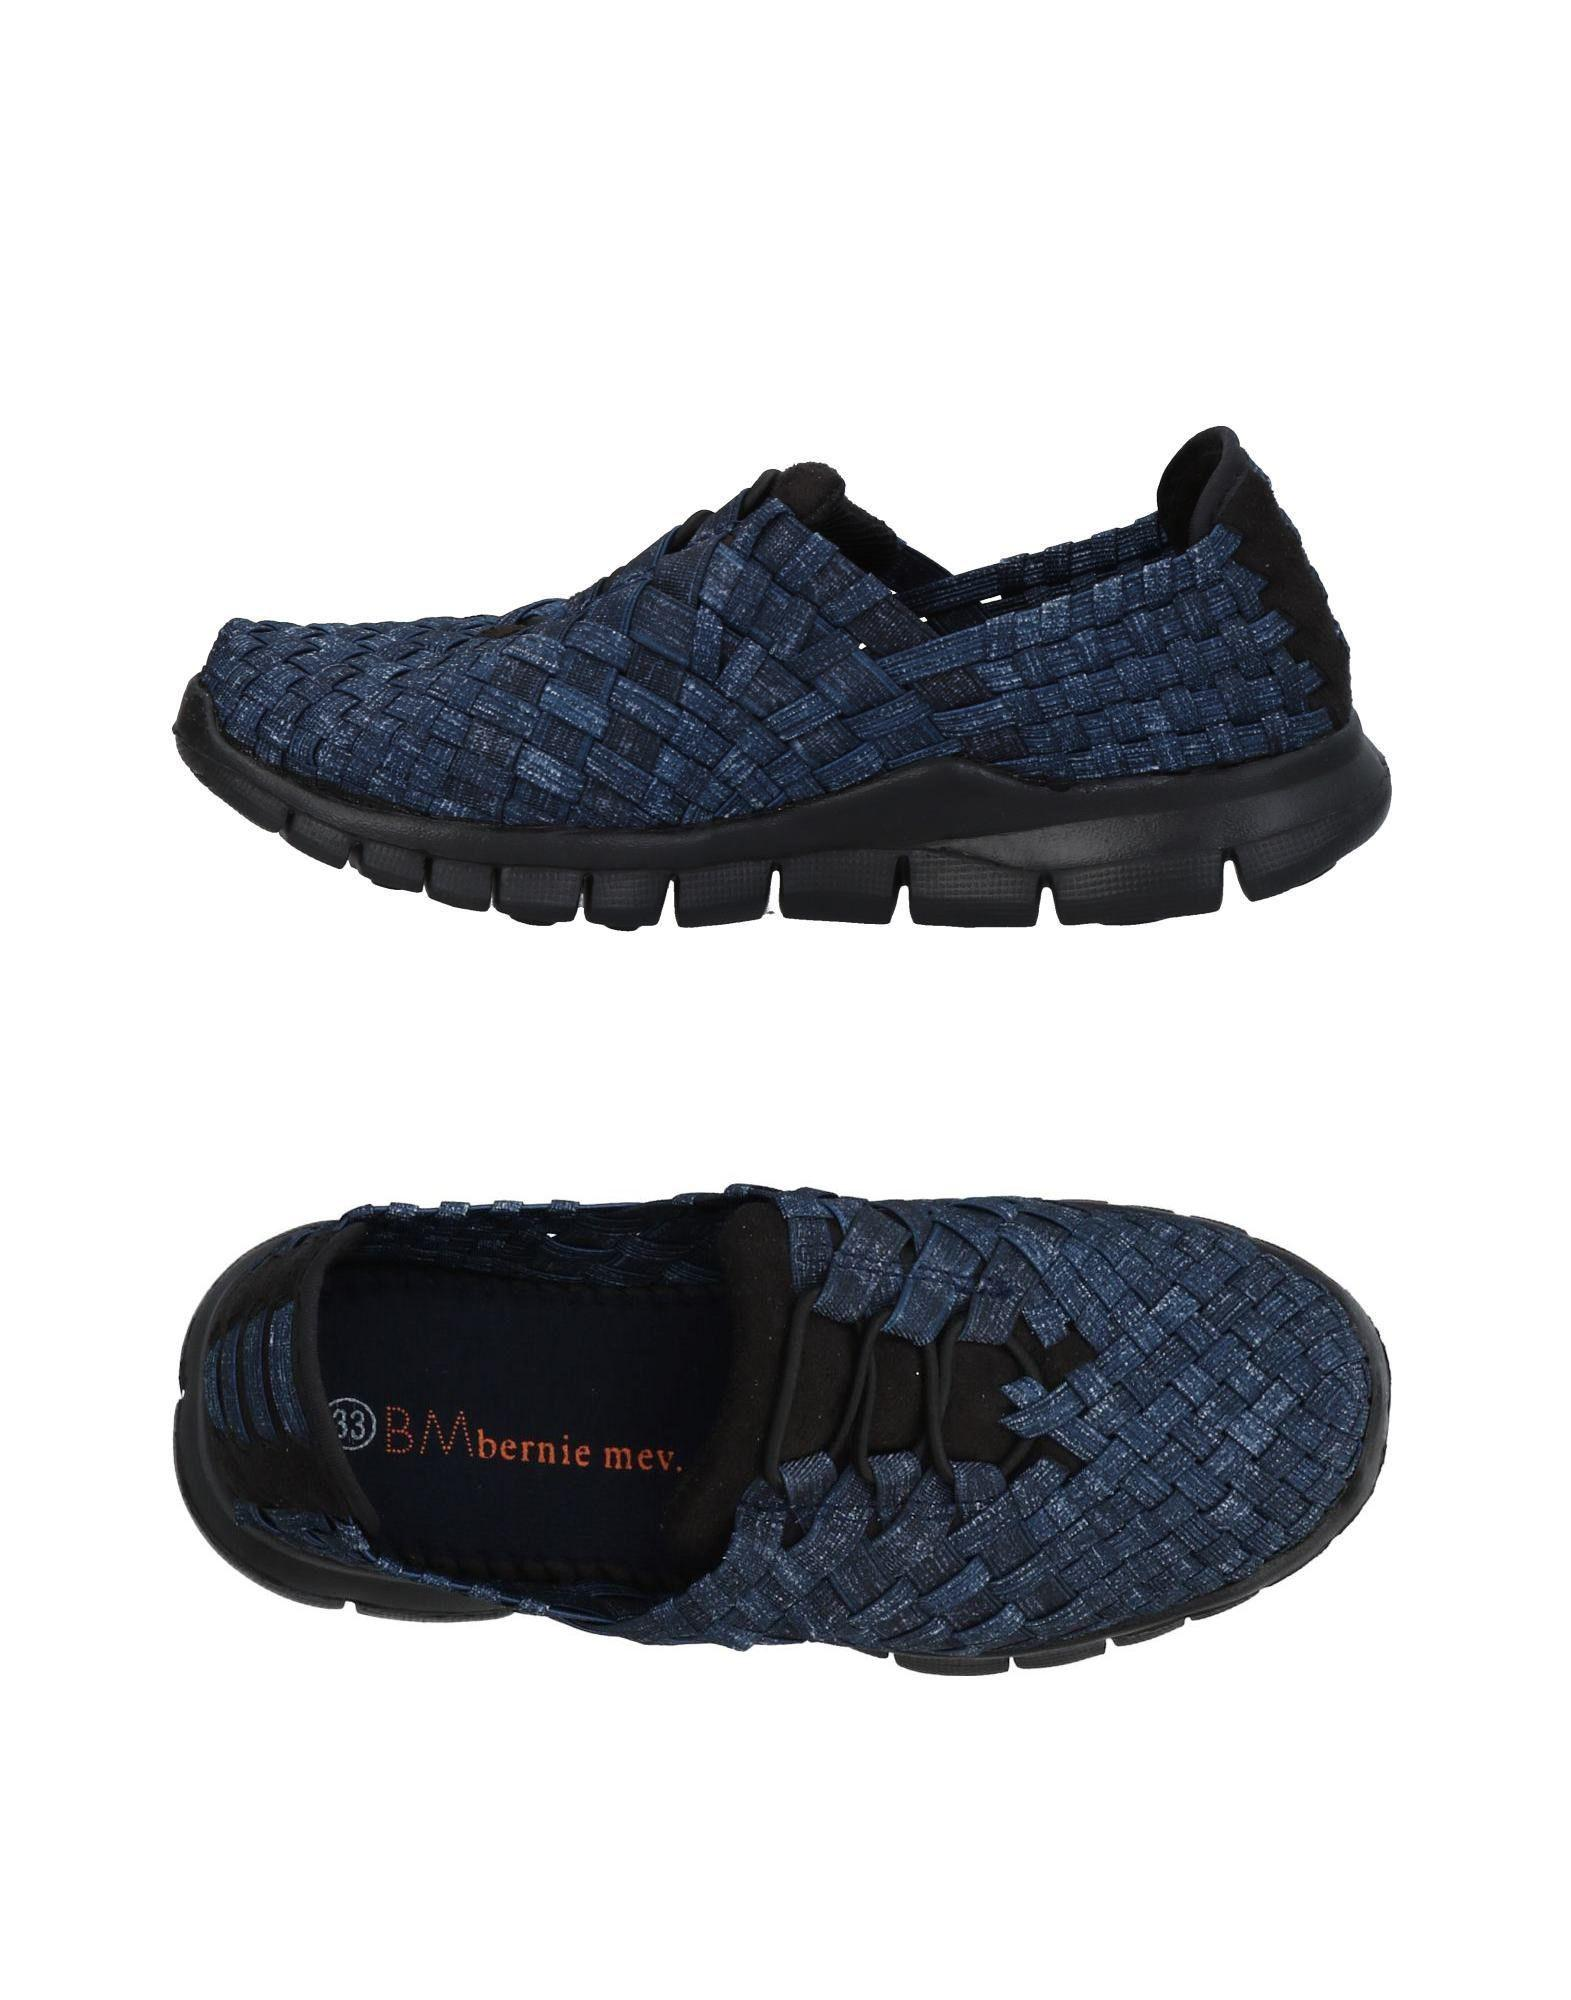 Chaussures - Bas-tops Et Baskets Bernie Mev. vD2epn6CG